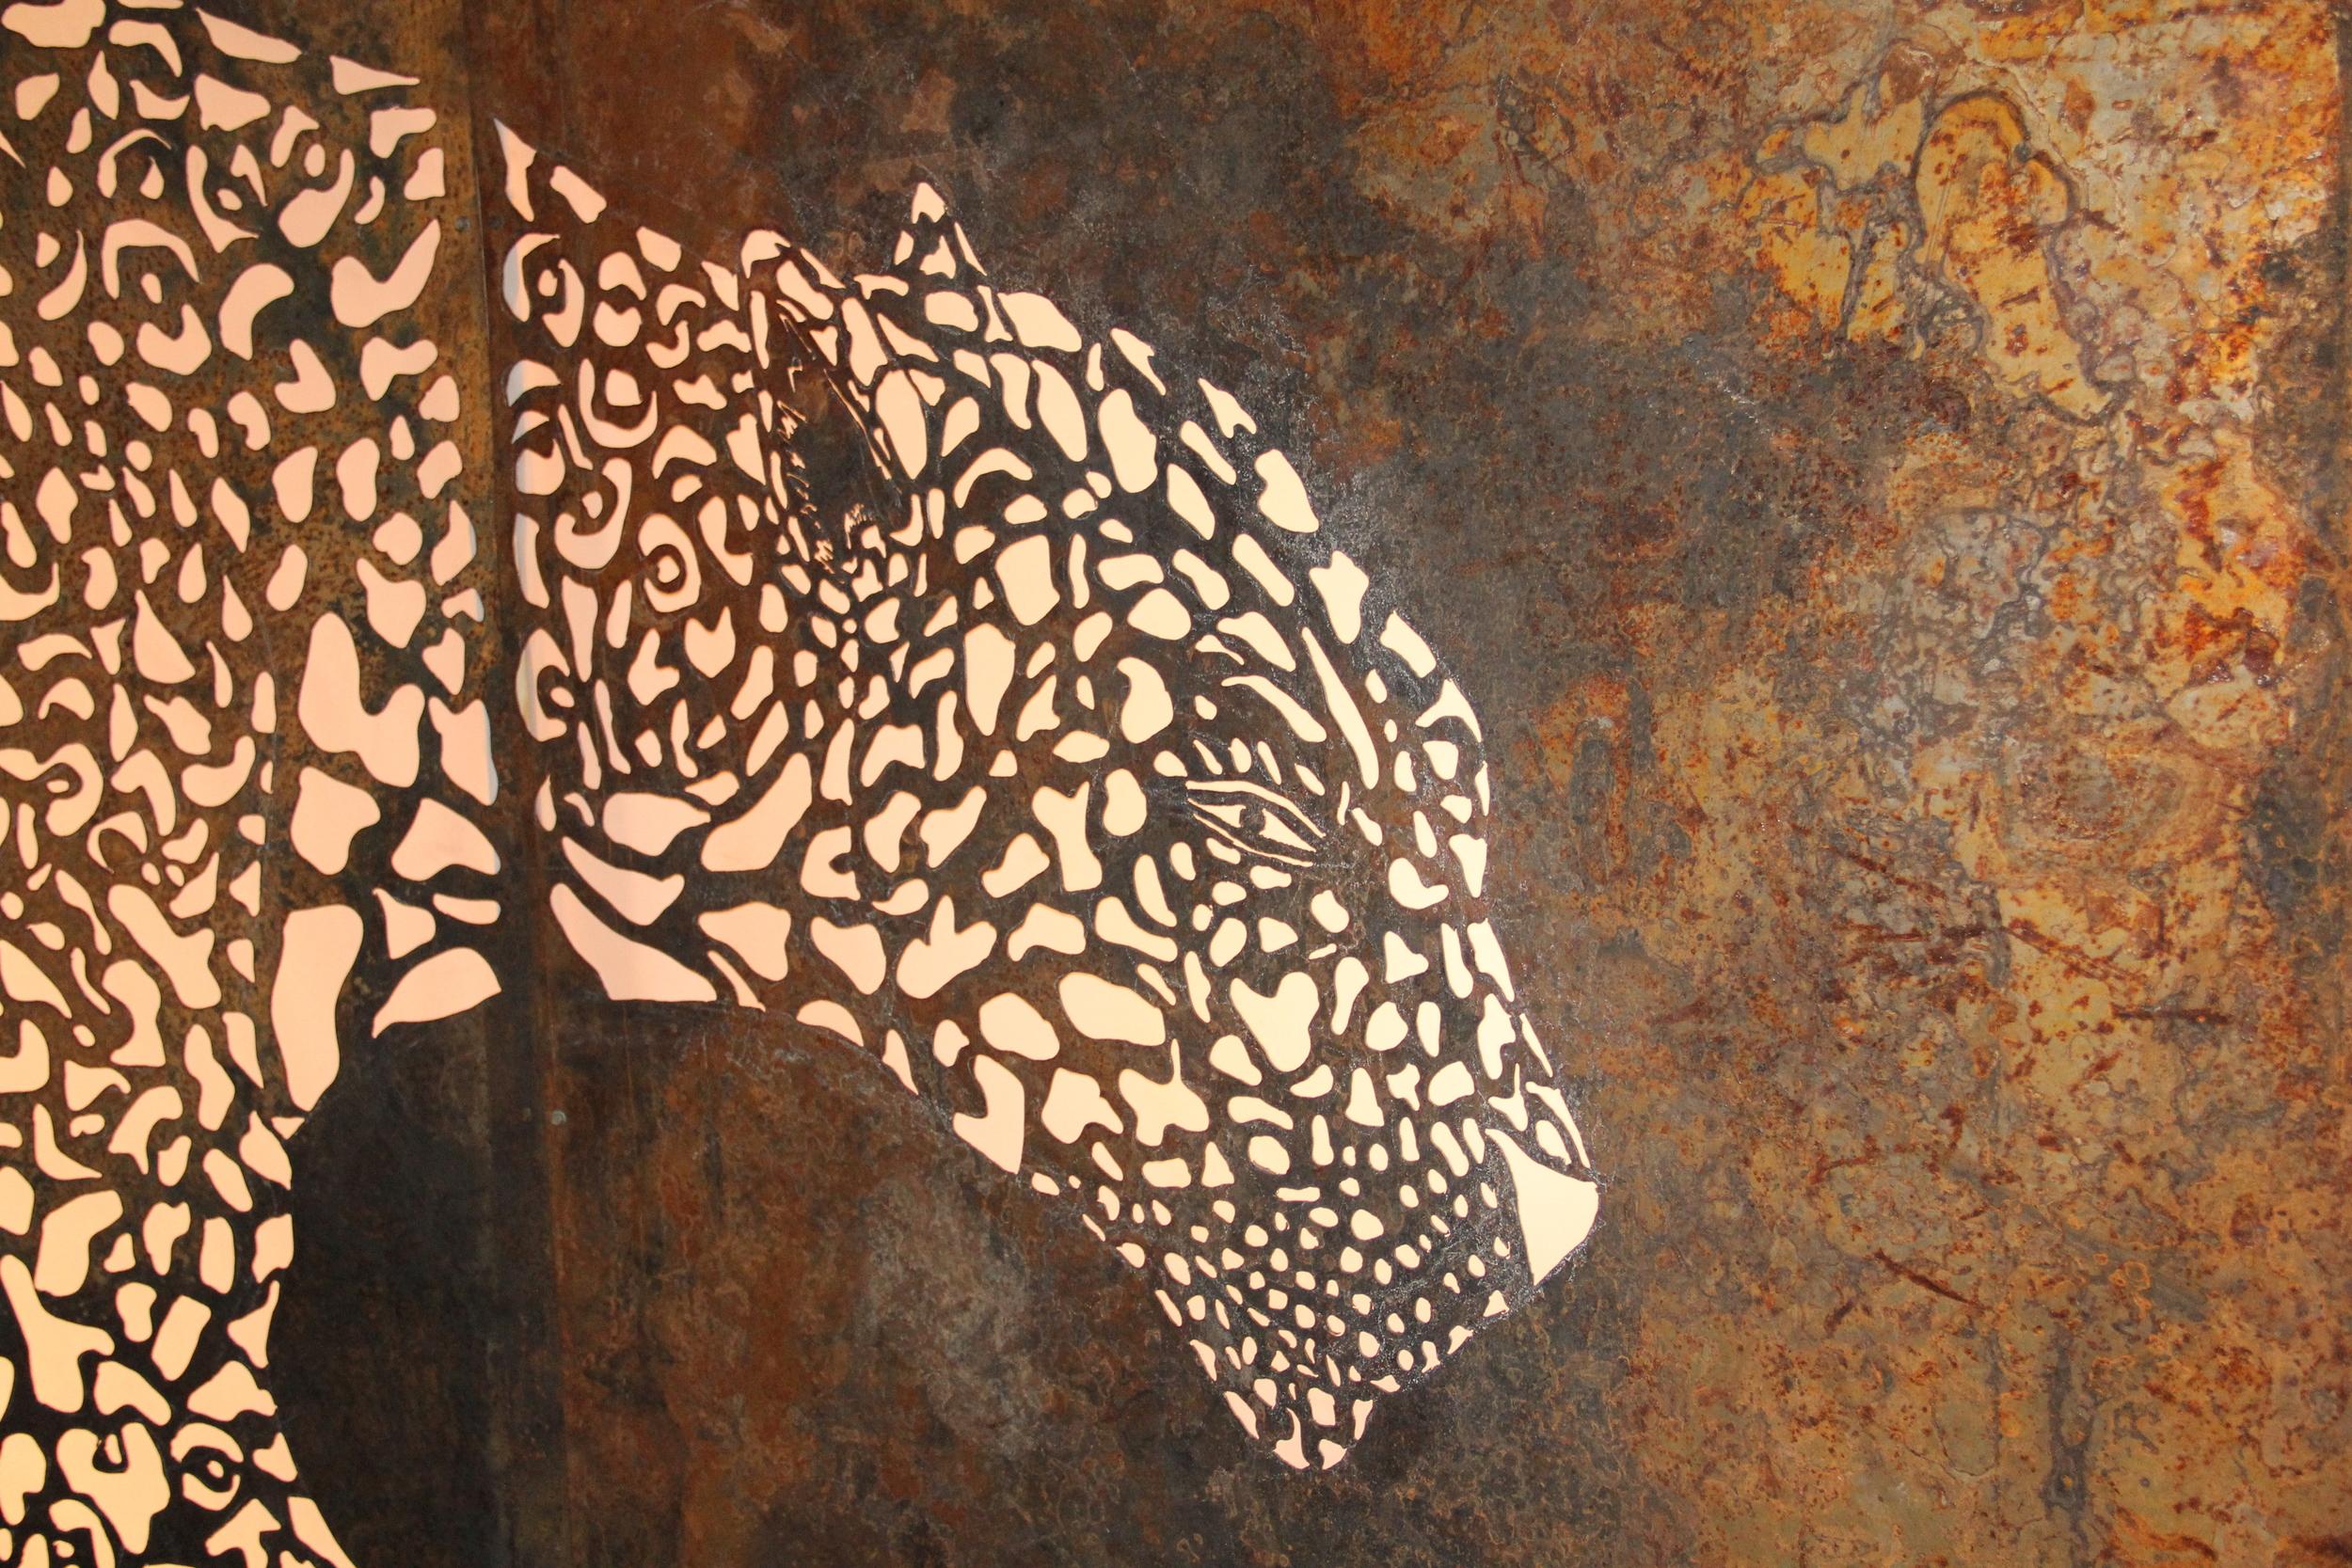 Leopard (detail)